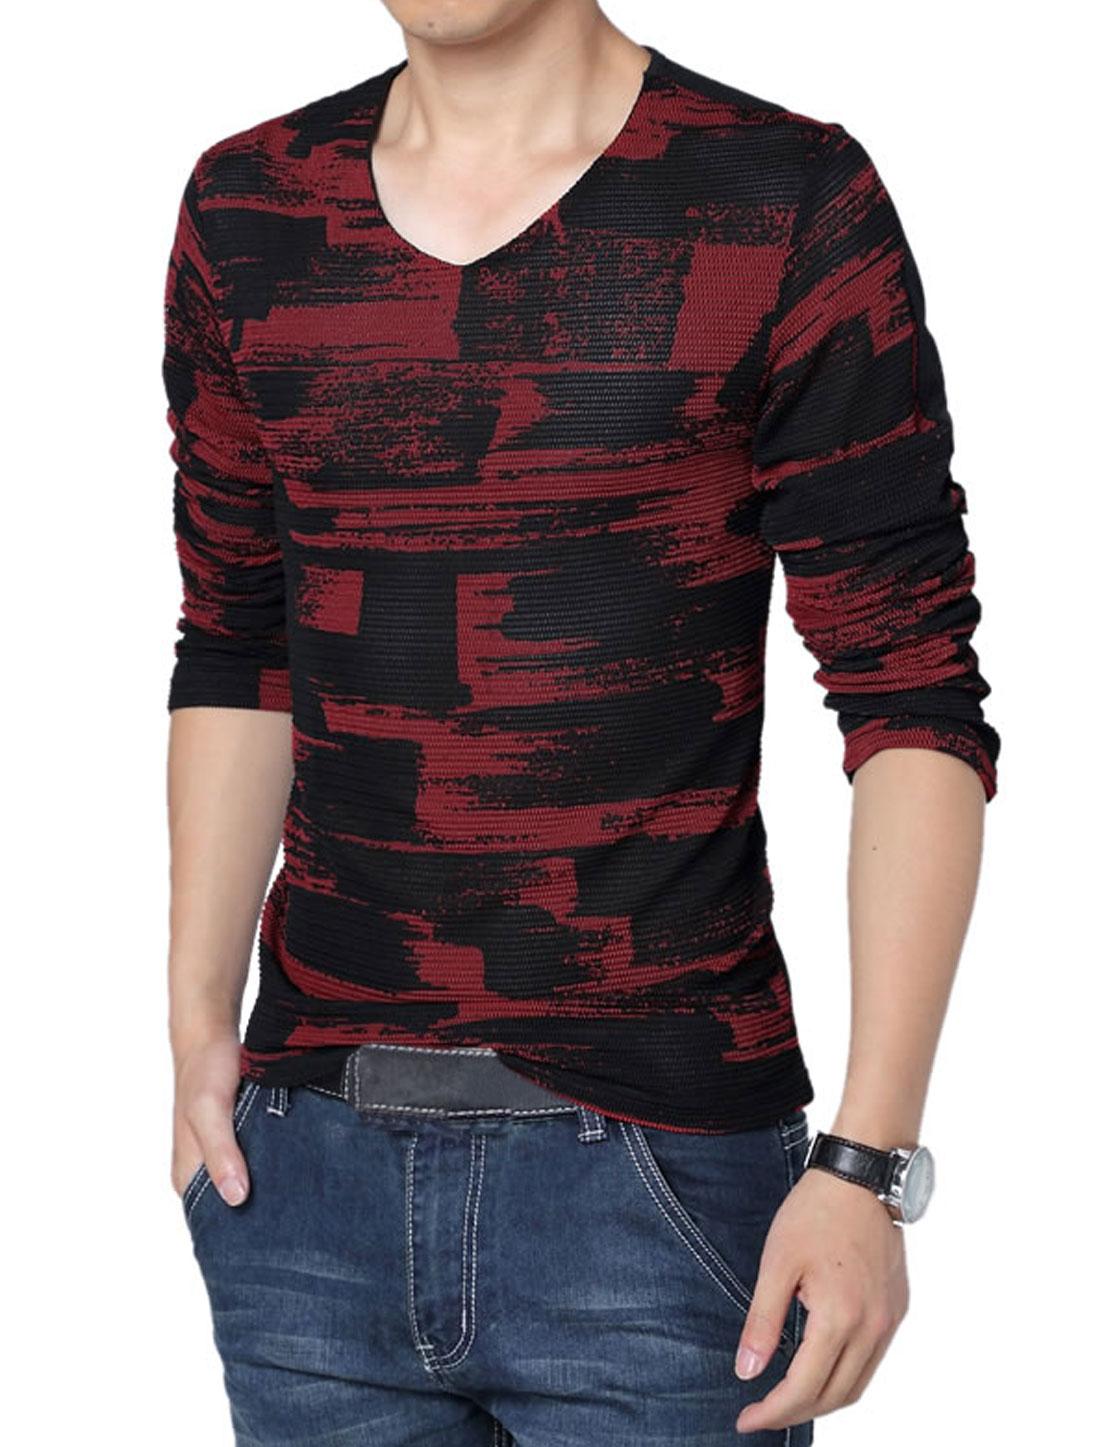 Men V Neck Long Sleeve Novelty Prints Panel Casual Shirt Red Black M